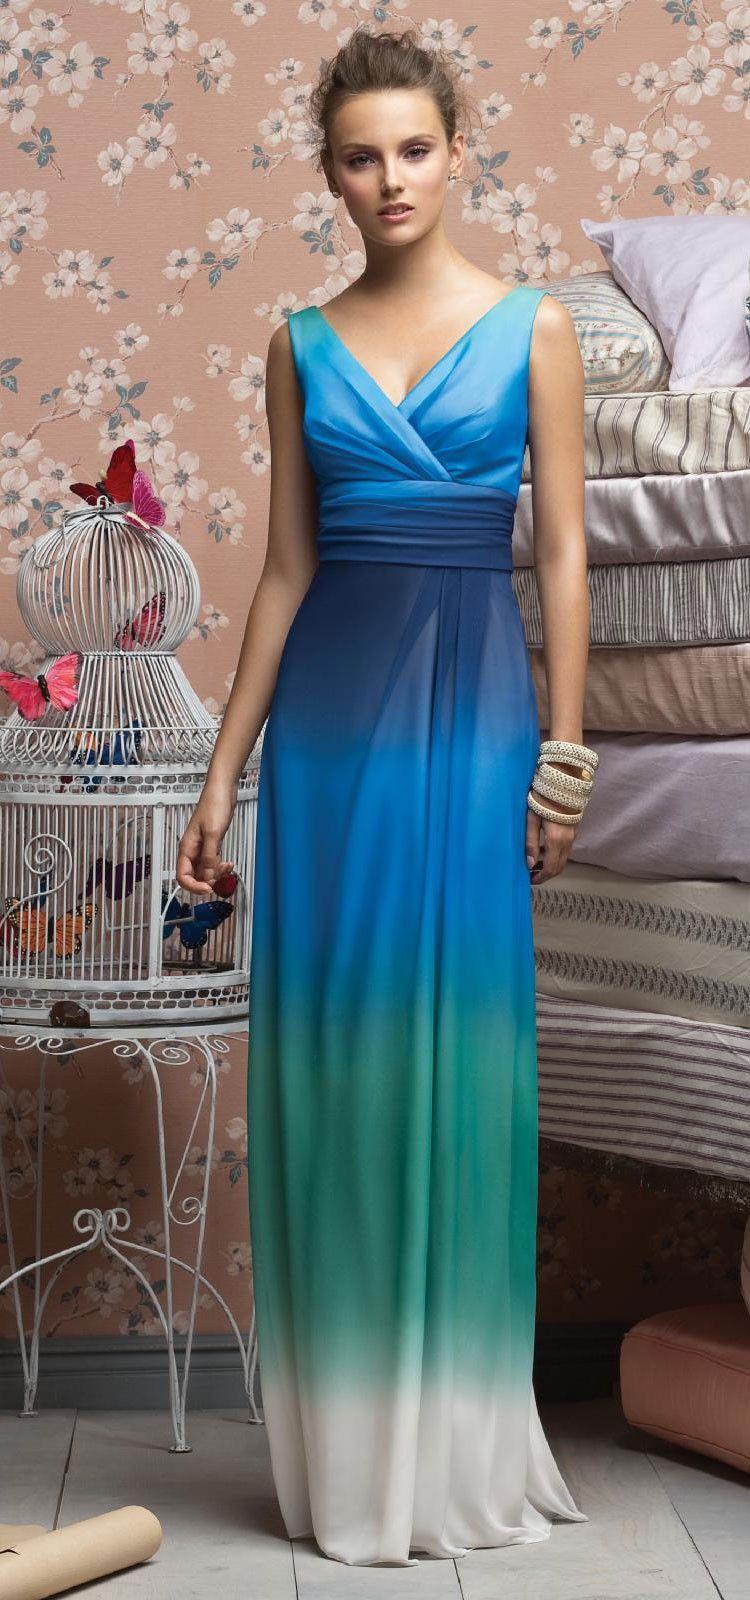 Wedding Attire: Pacific Blues Ombre Bridesmaid\'s Dress in a light ...